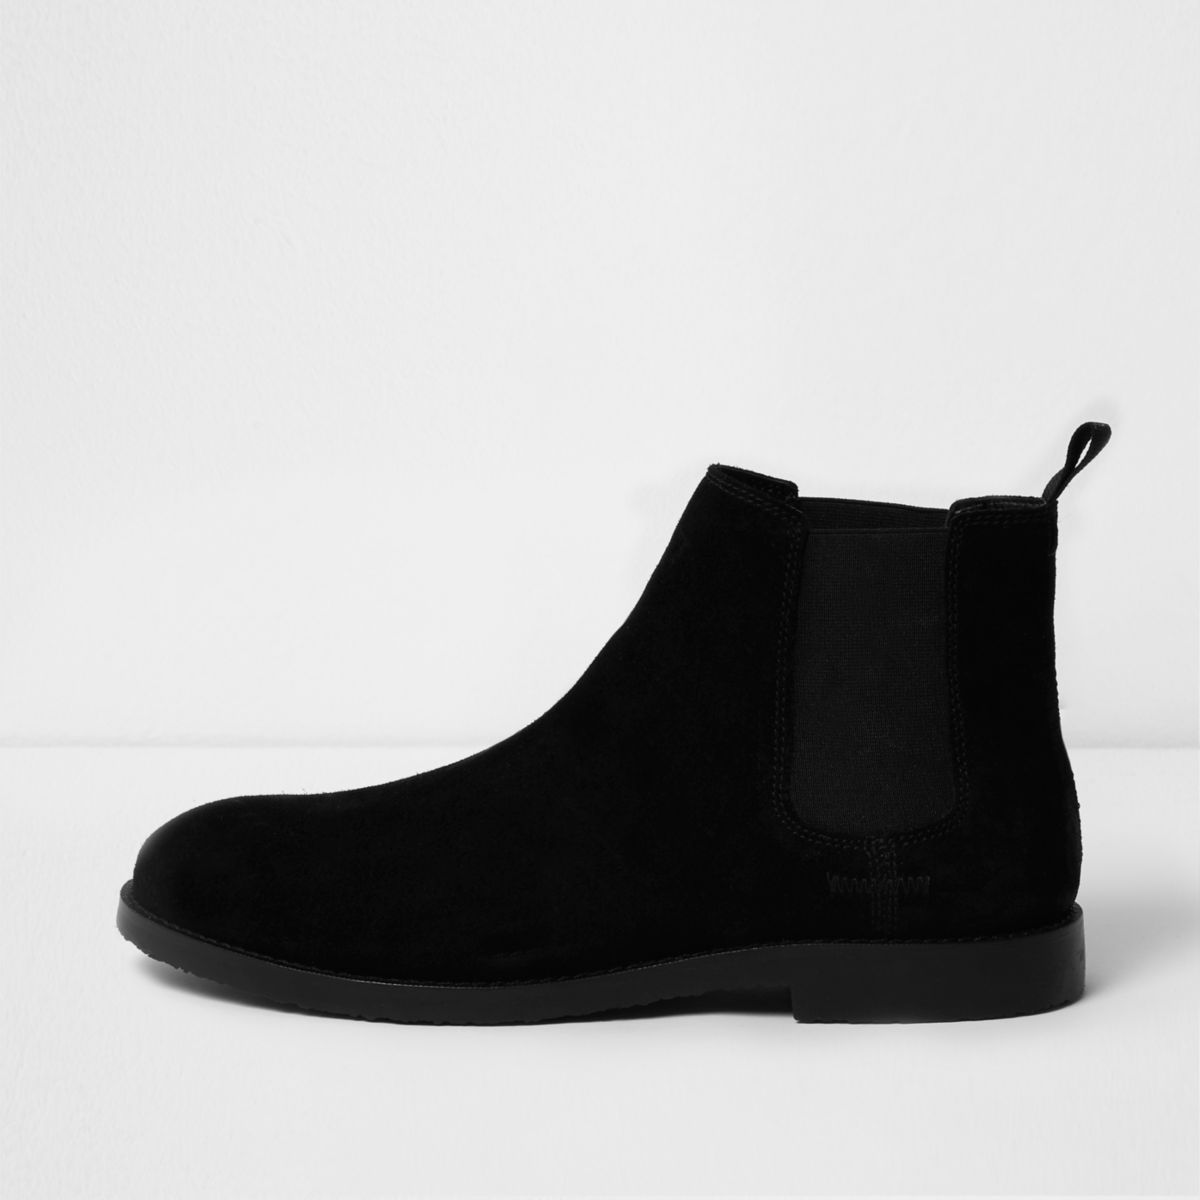 Mens Shoes Boots Casual River Island D Slip On Mocasine Brown Black Suede Chelsea